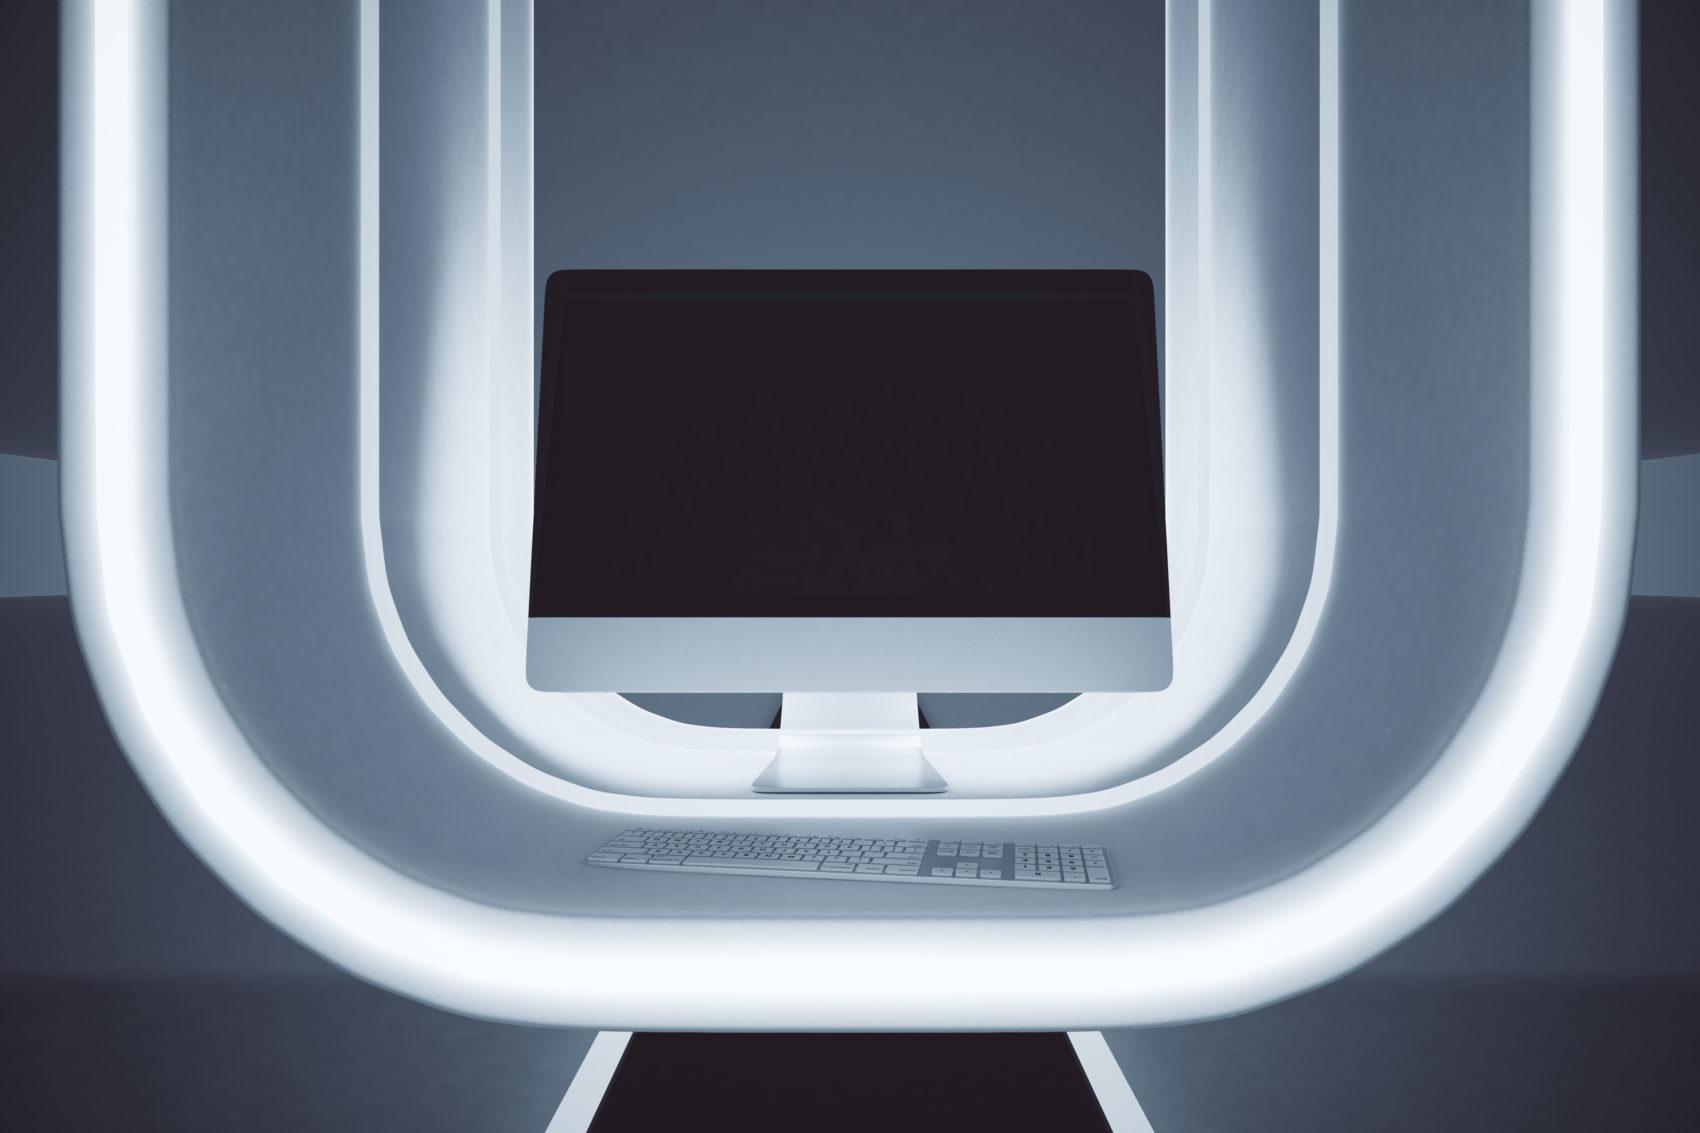 Futuristic workplace